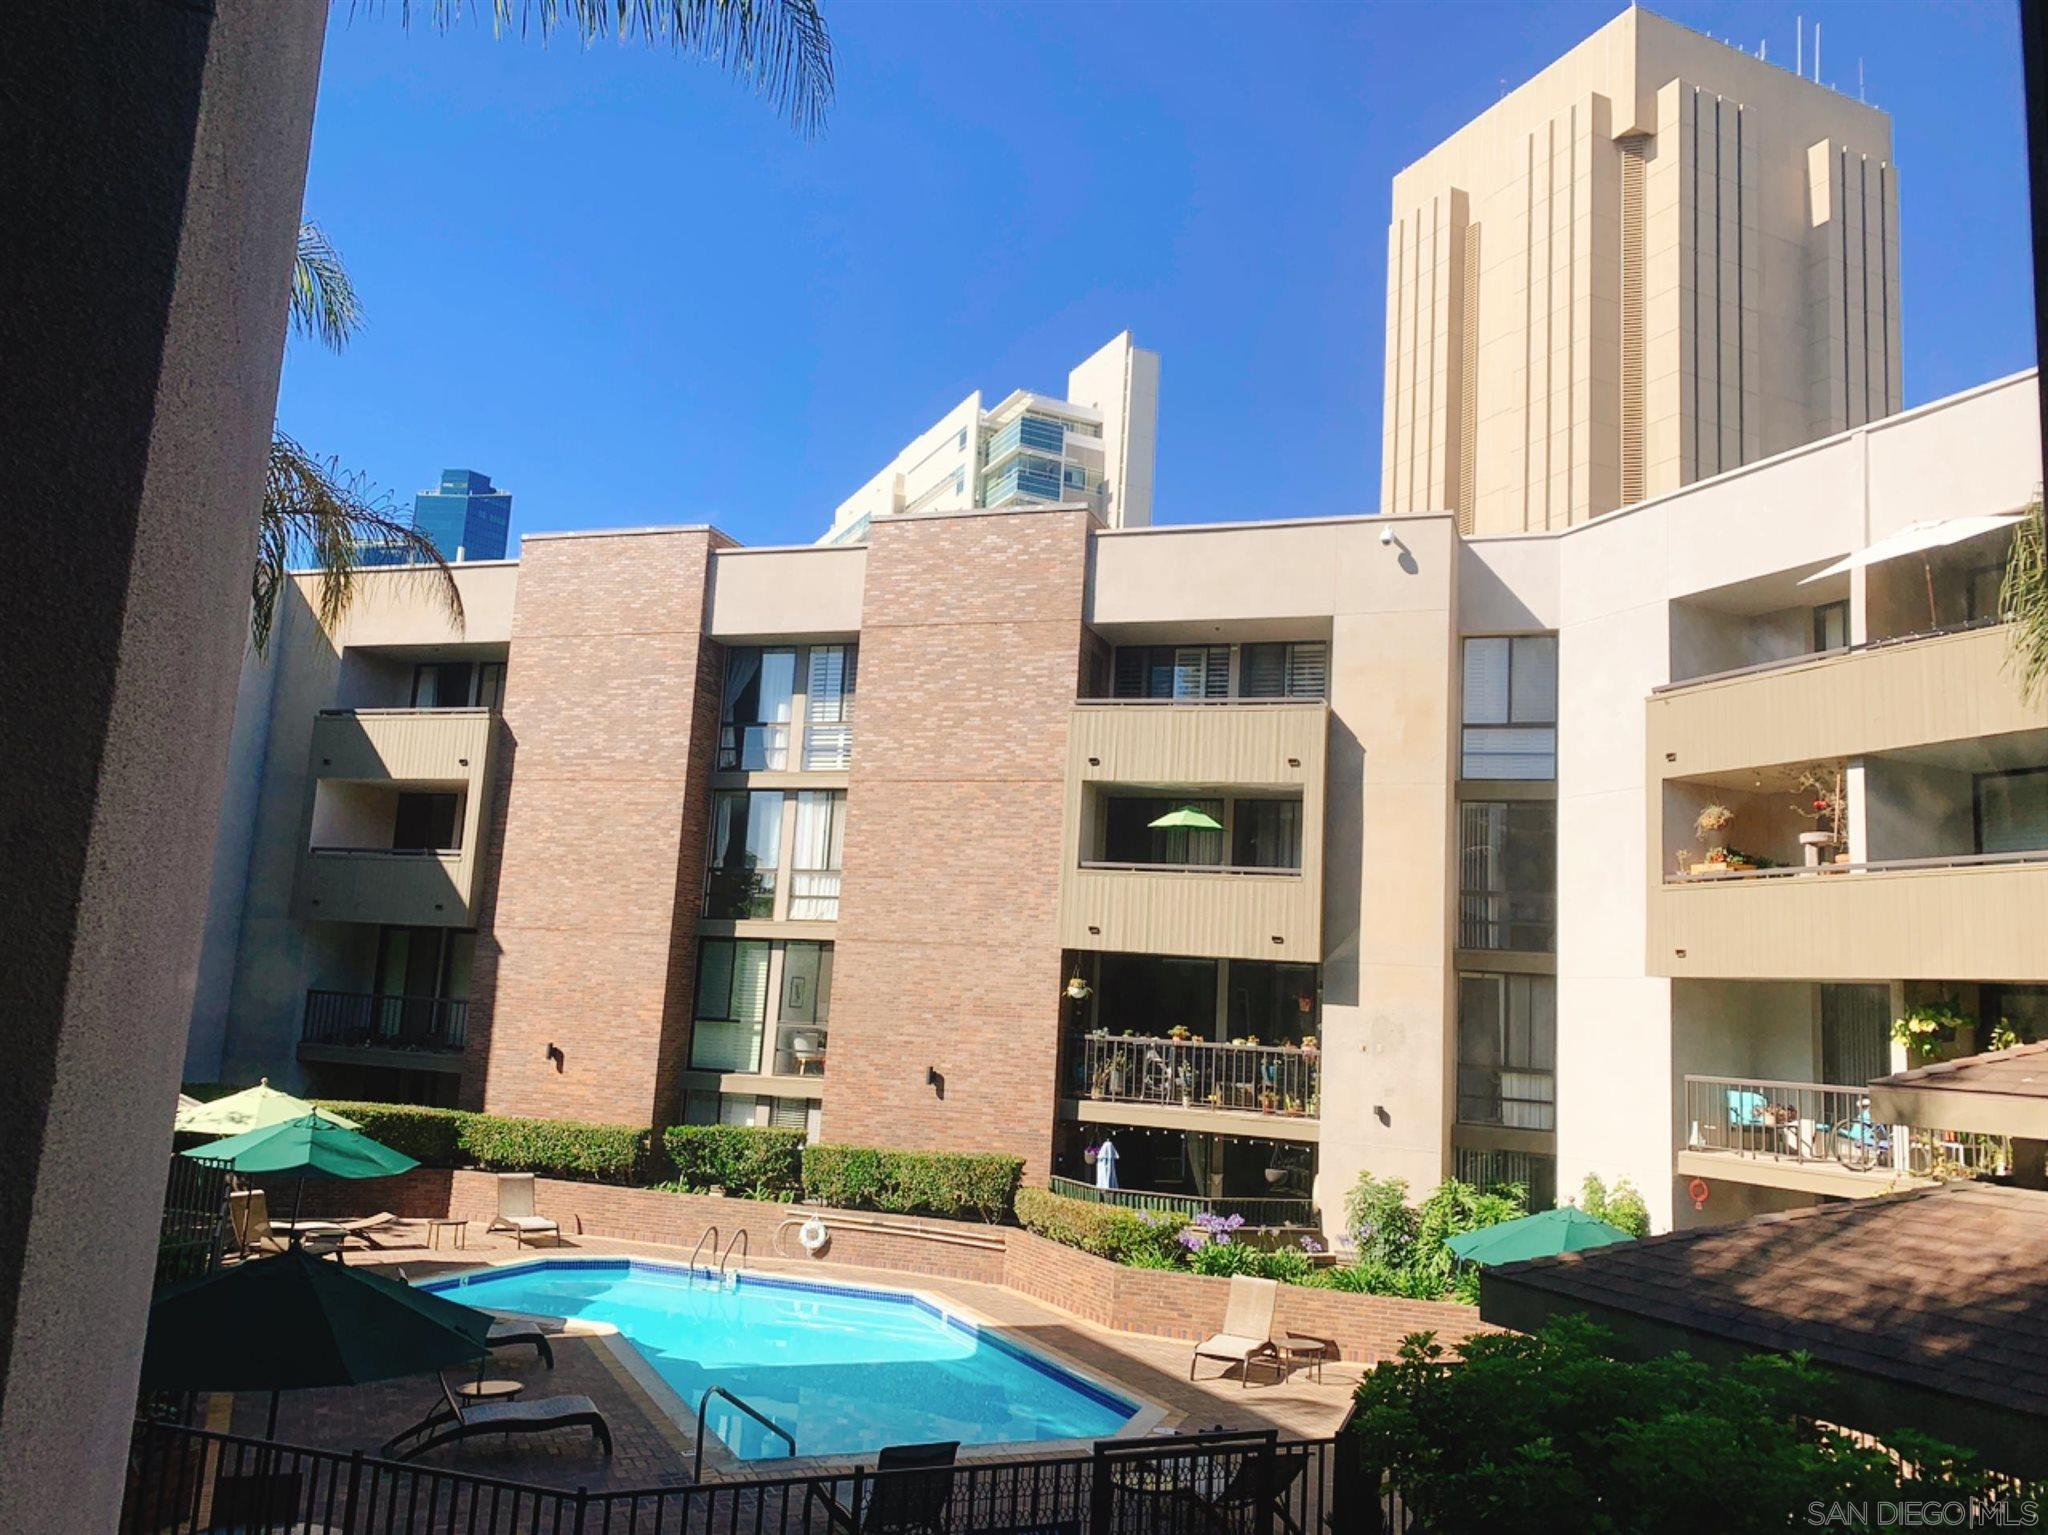 MLS 210015688 San Diego Condo for sale